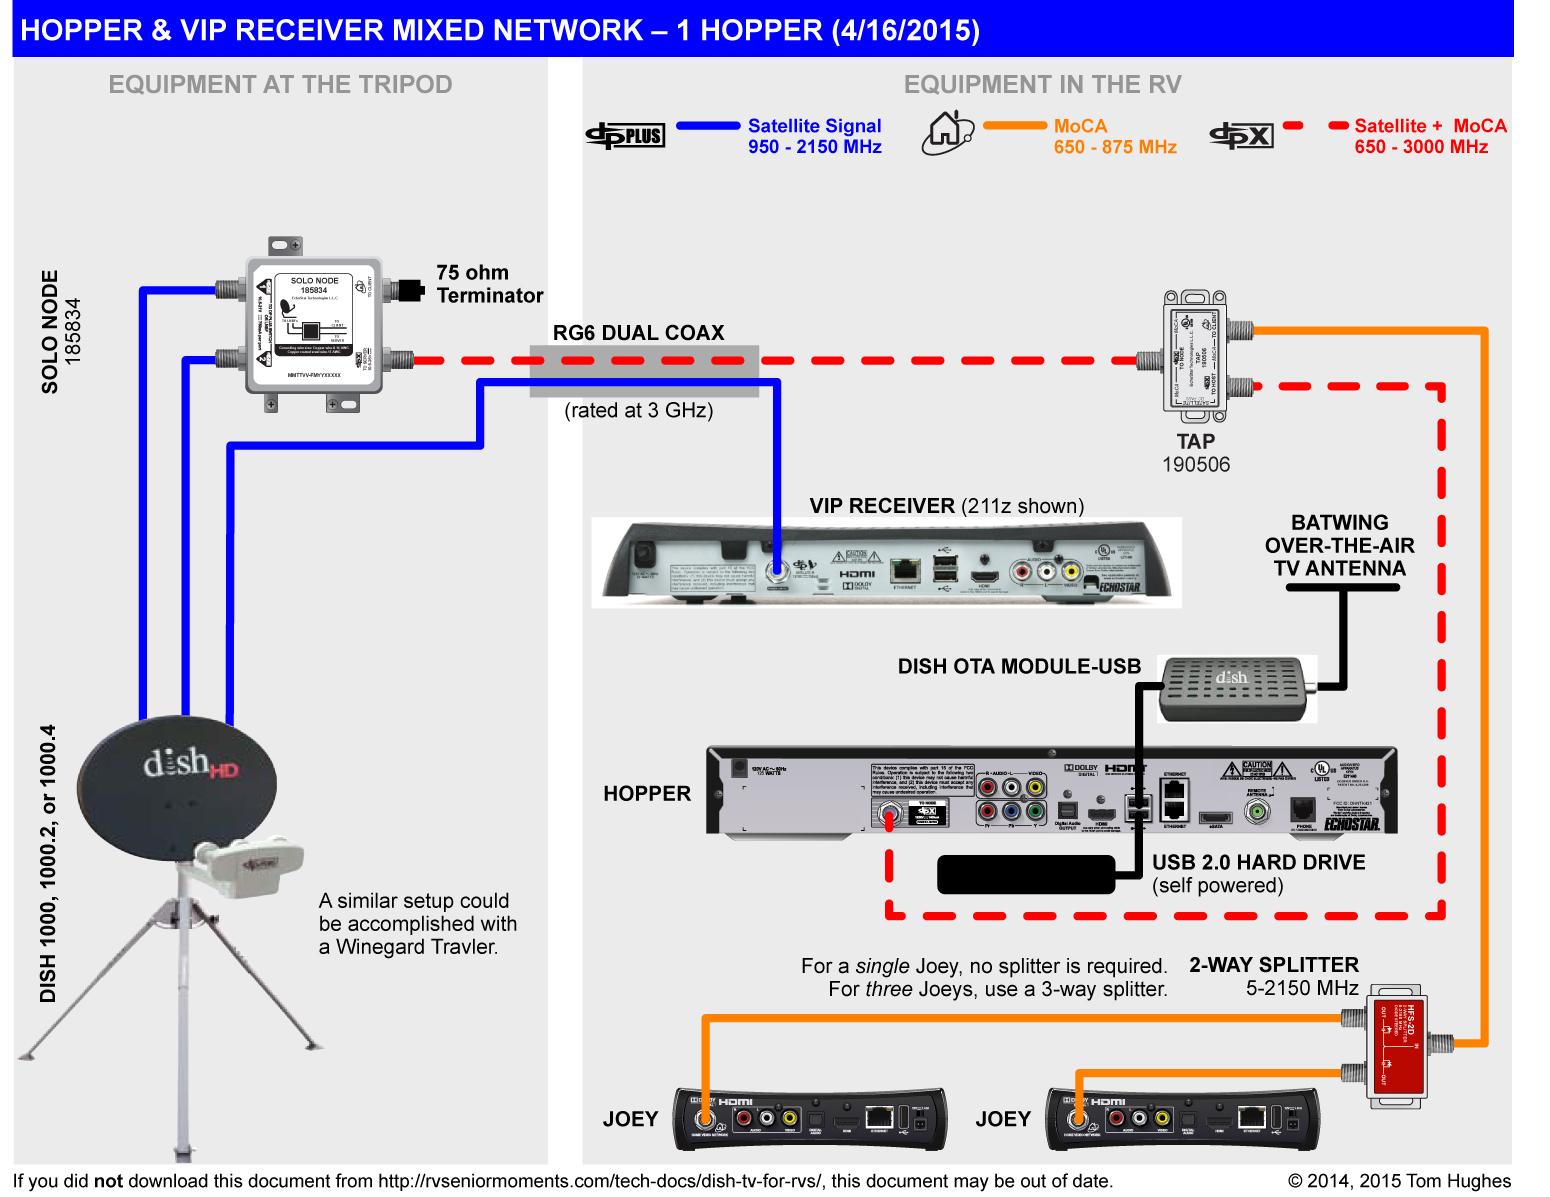 901_dish_hopper_vip_mixed_network_1hopper720dpi?resize=525%2C405 dish network hopper installation diagram periodic & diagrams,Dish Wiring Installation